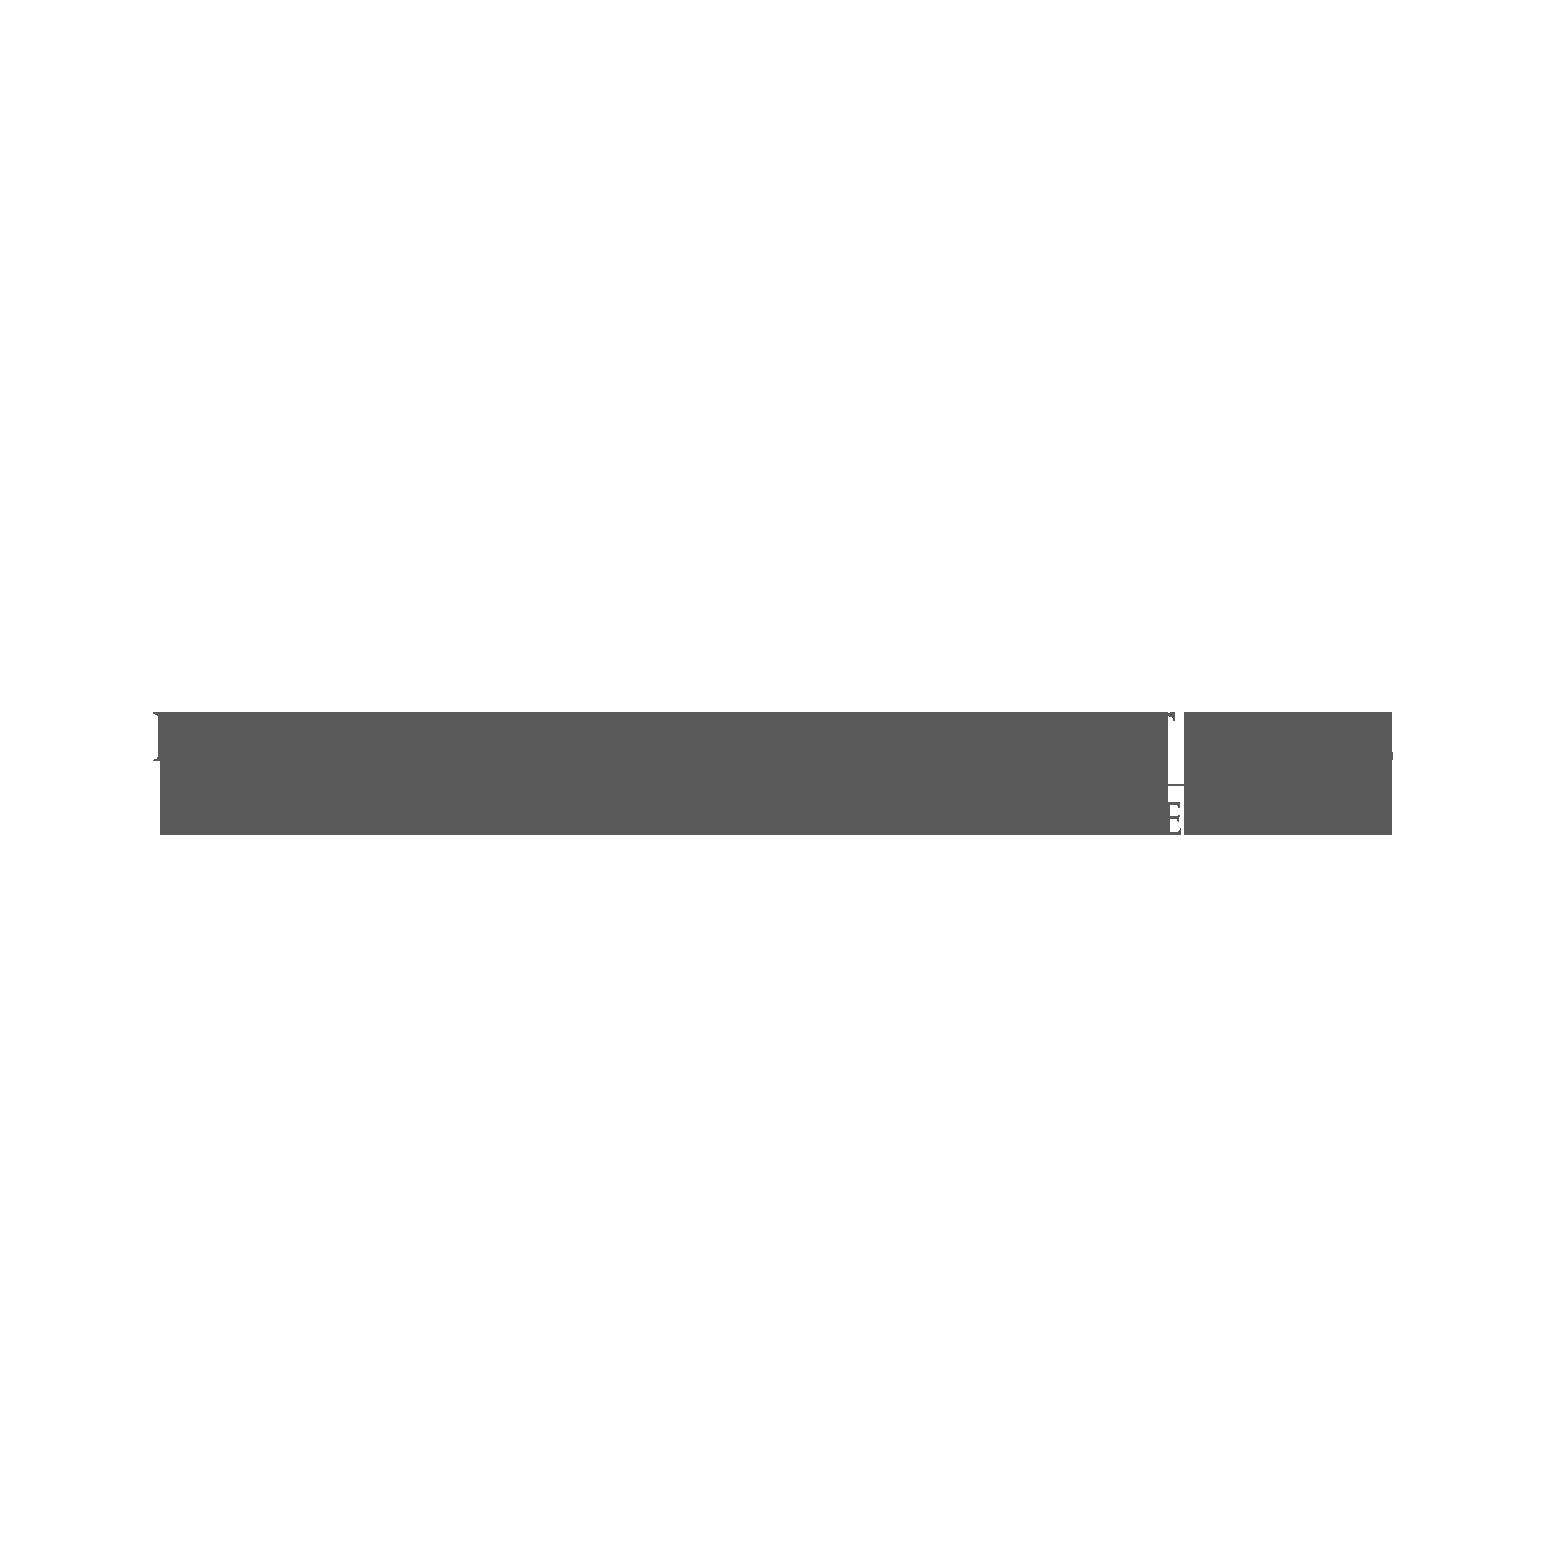 Edward M. Kennedy Institute for the United States Senate